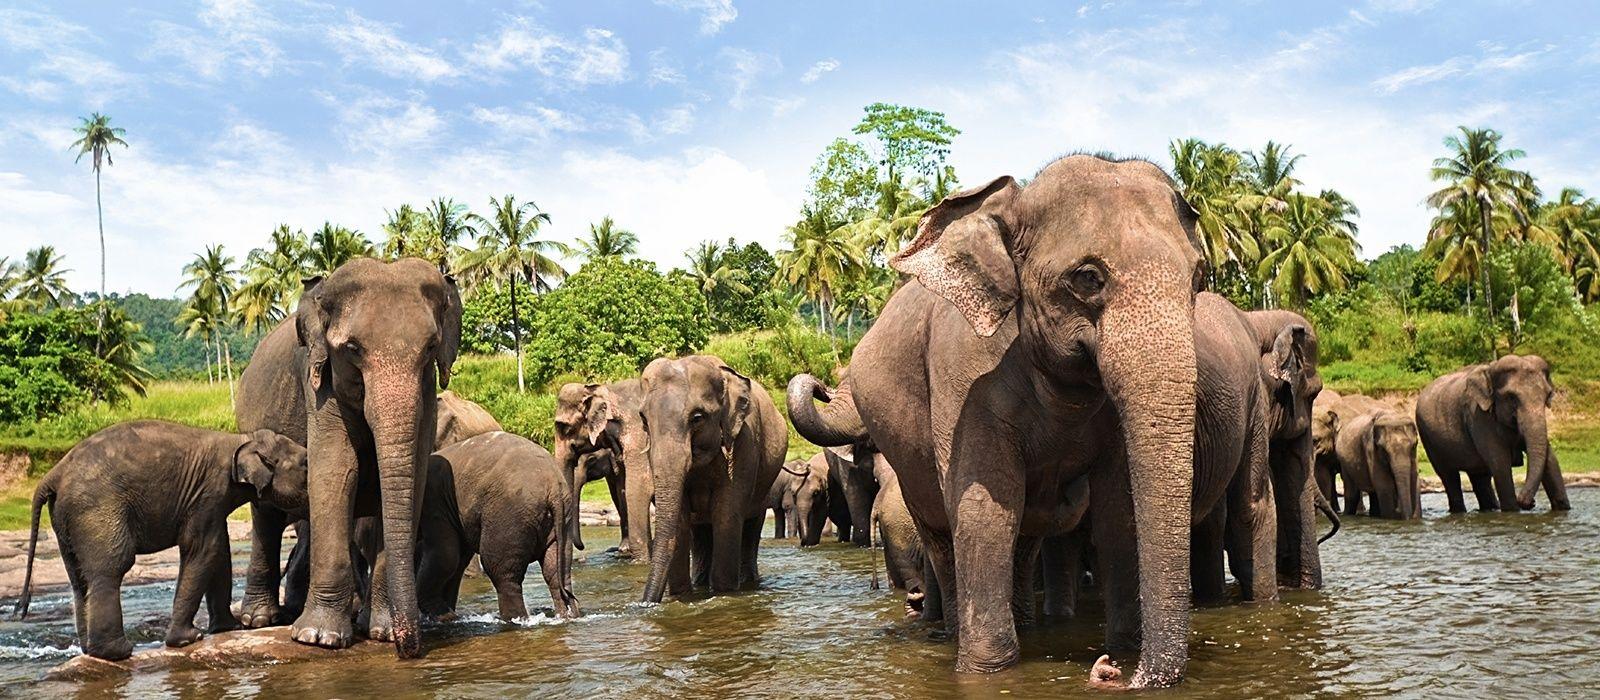 Luxuriös und hautnah – Große Sri Lanka Rundreise Urlaub 4